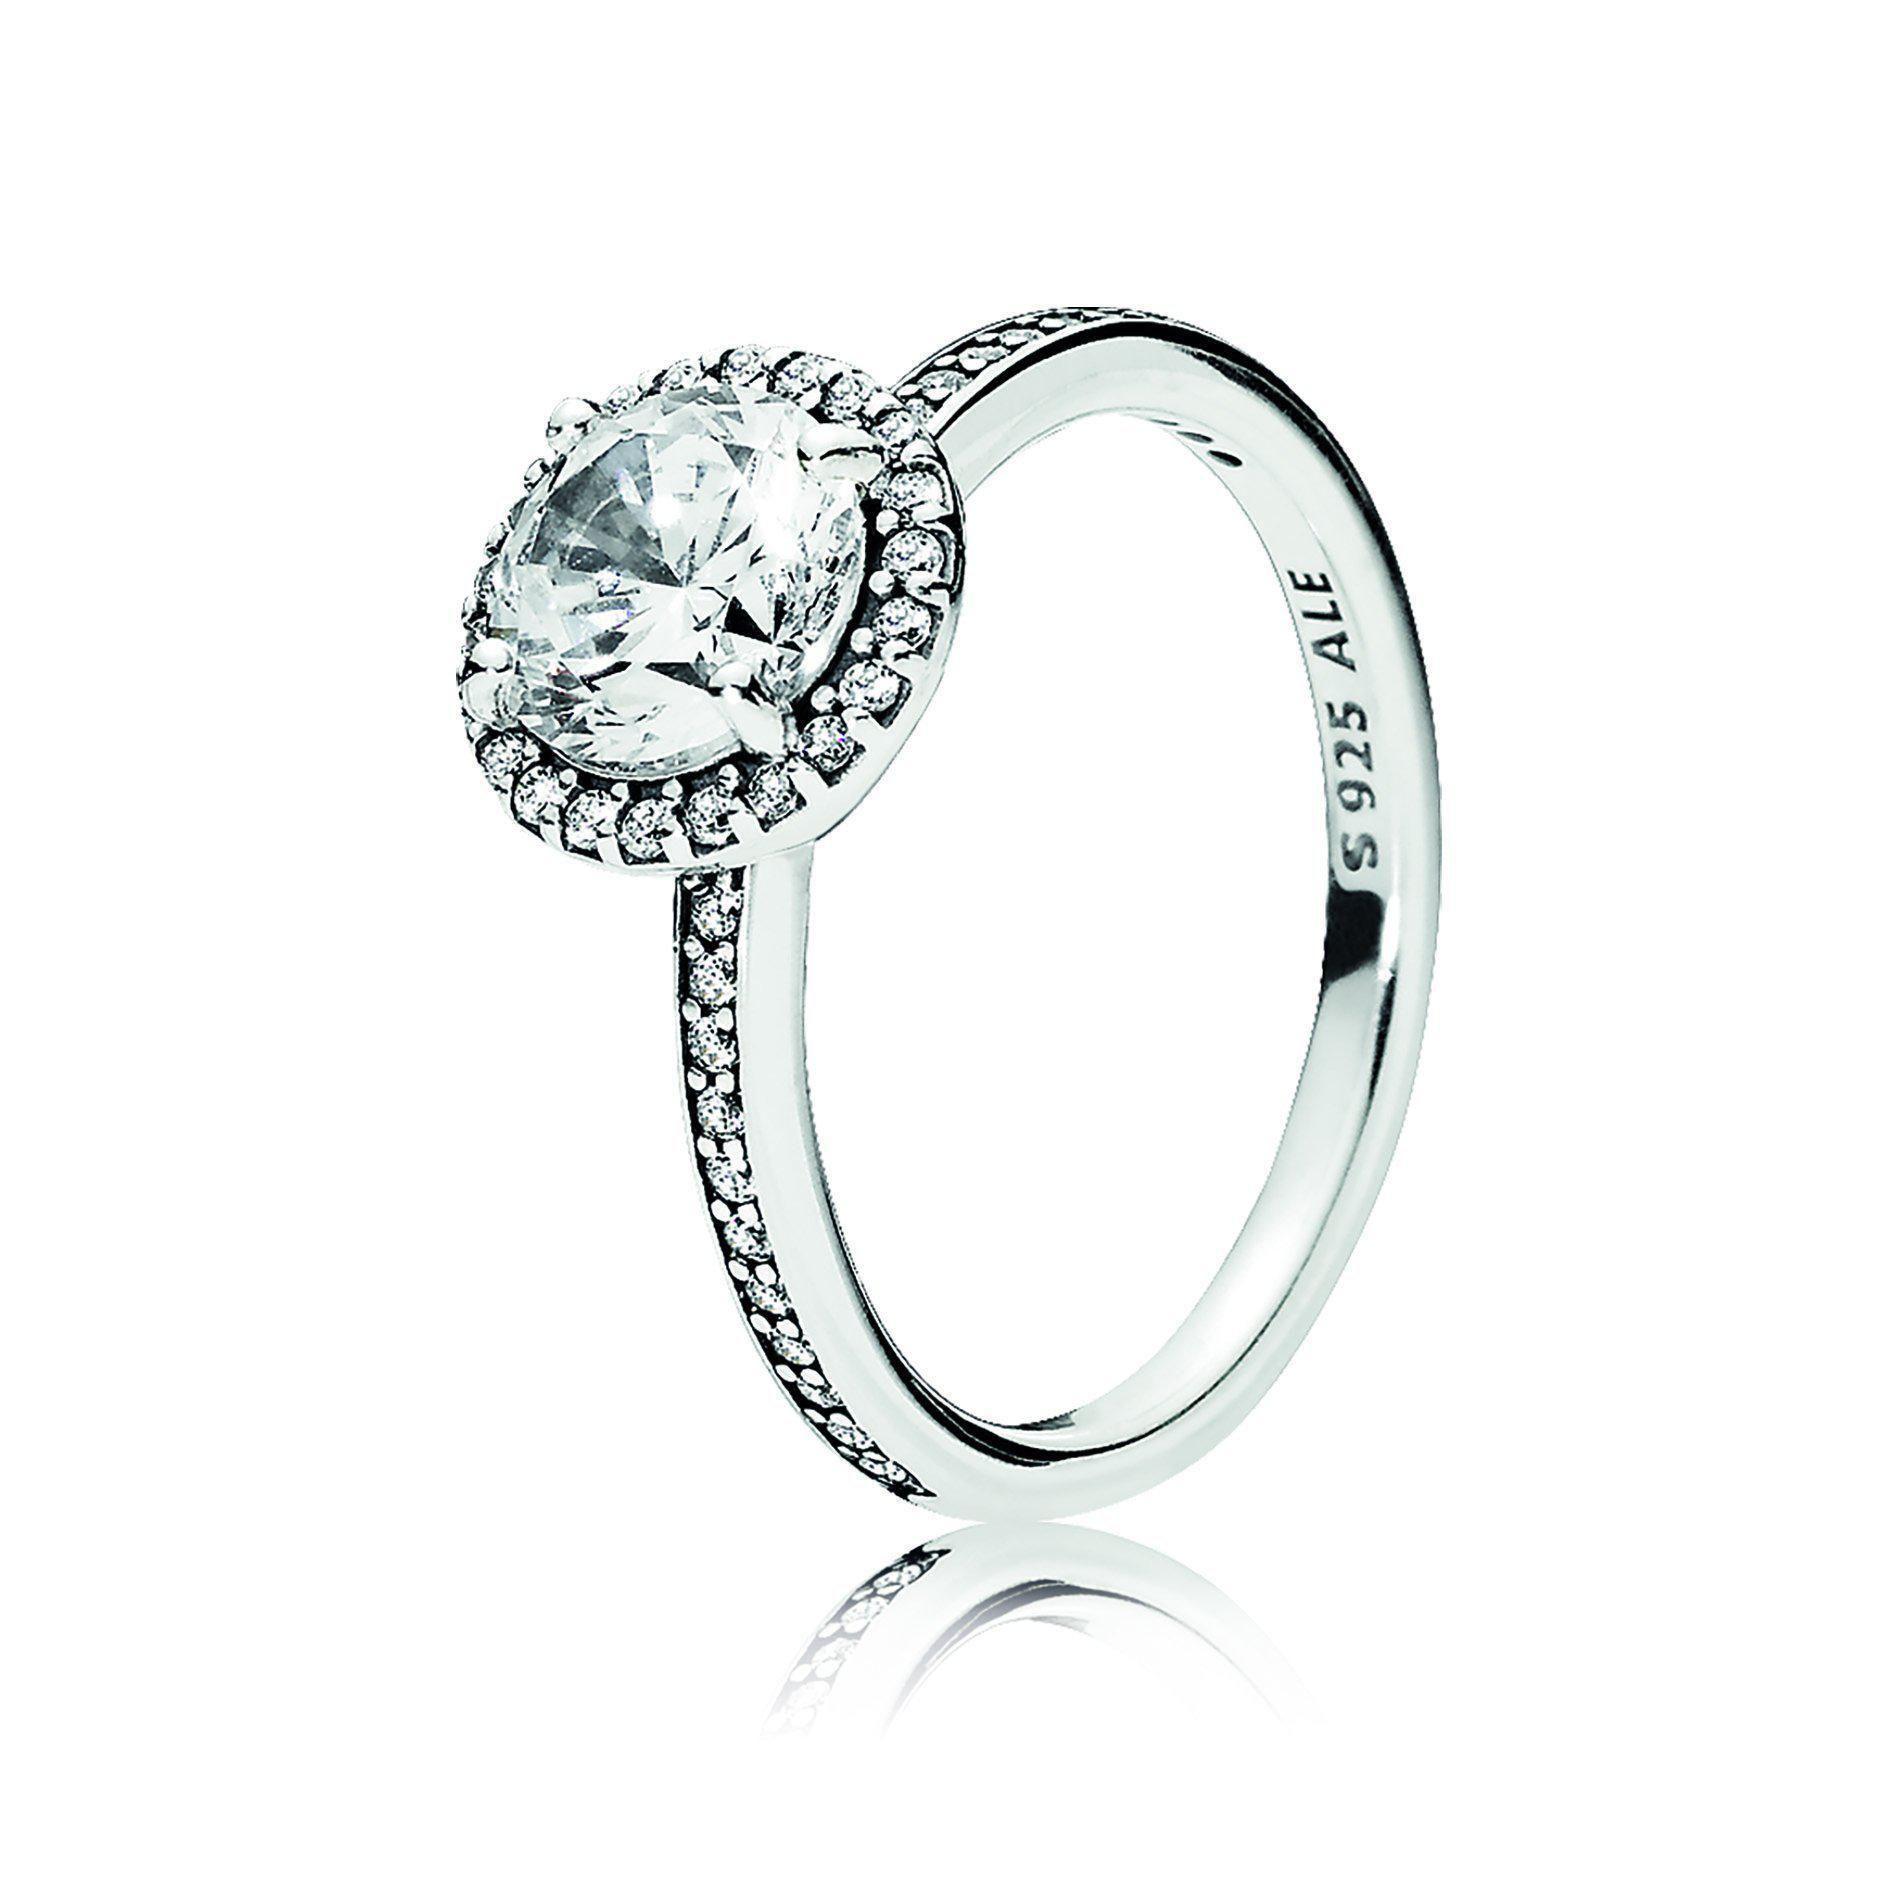 196250CZ Classic Elegance Ring | Classic ring, Pandora rings ...